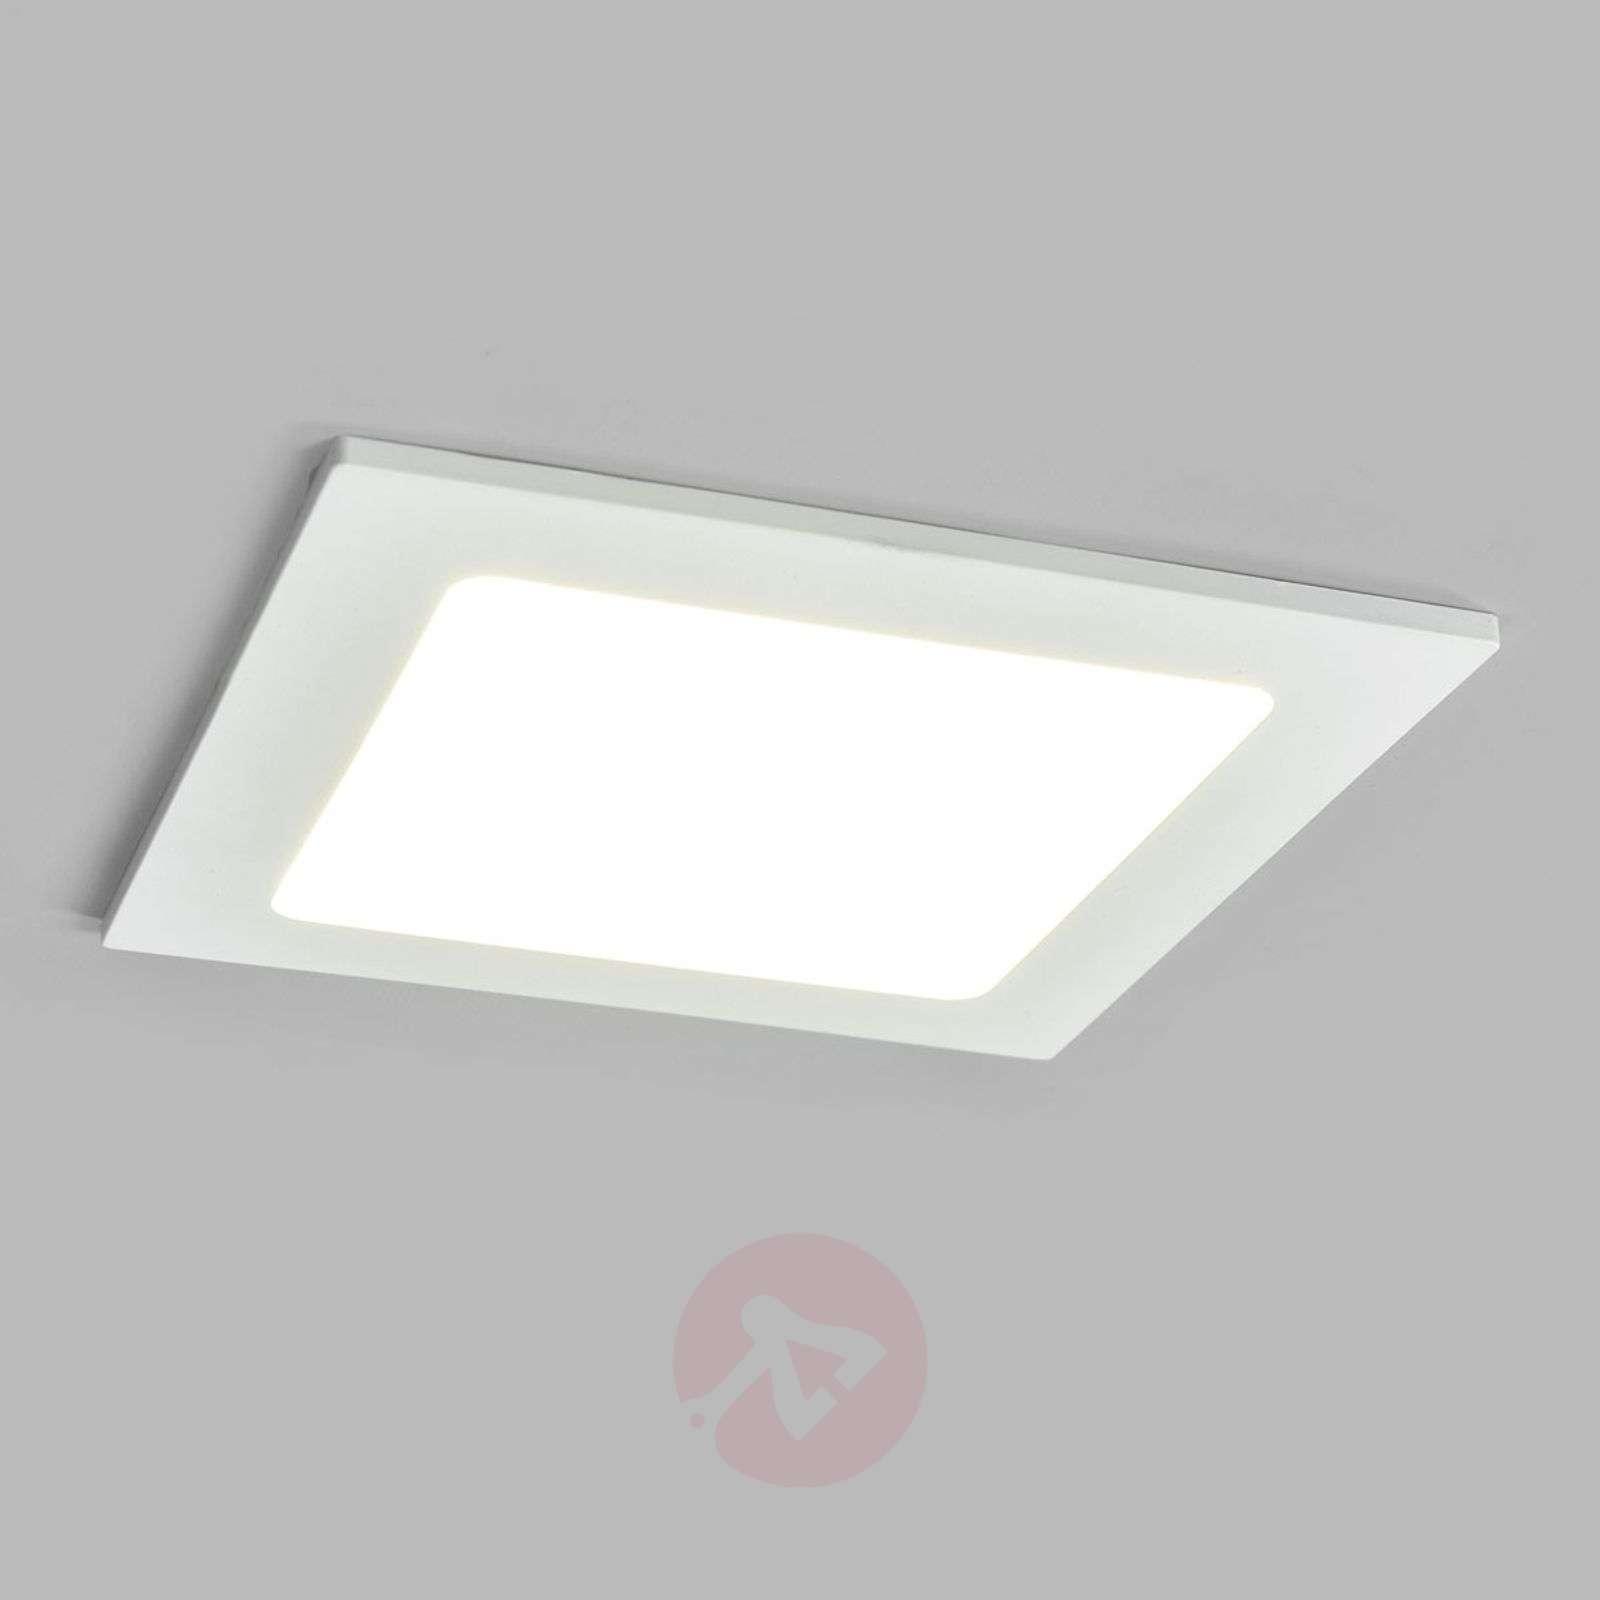 Joki LED downlight white 4000K angular 16.5cm-9978061-02